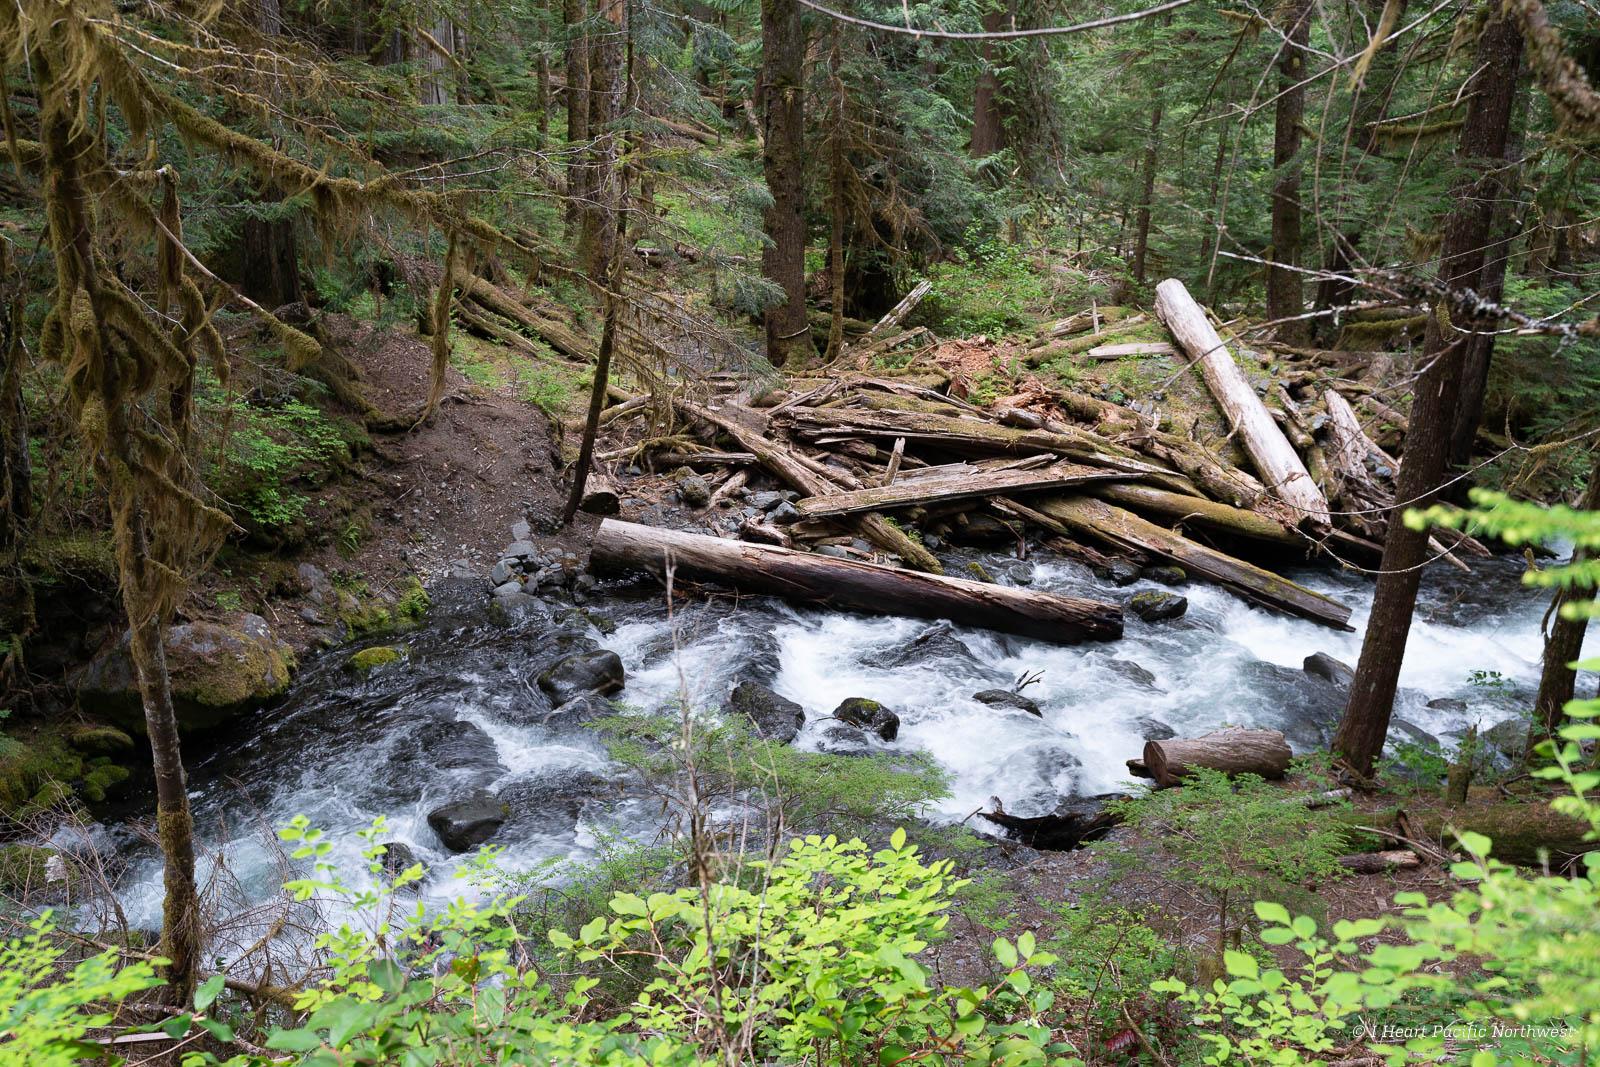 backpack - North Fork Skokomish Trail